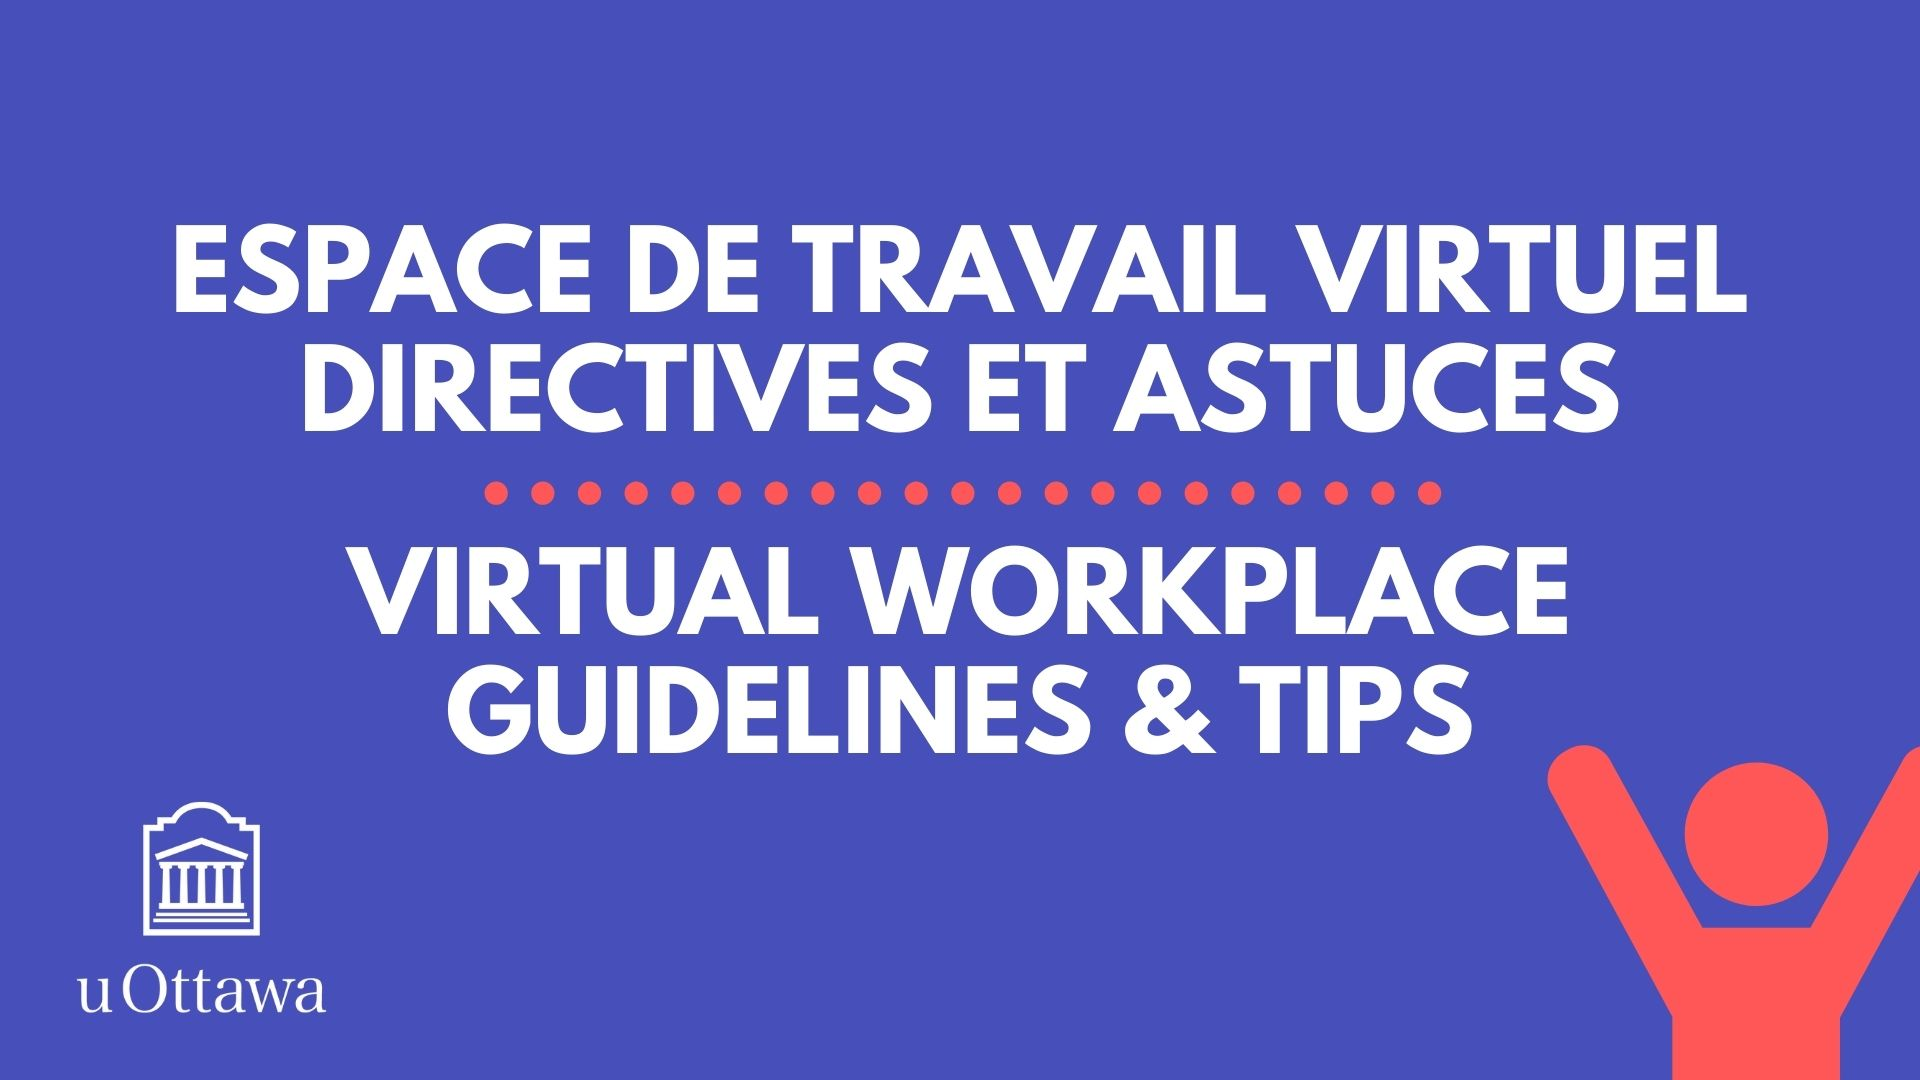 espace de travail virtuel | virtual workplace